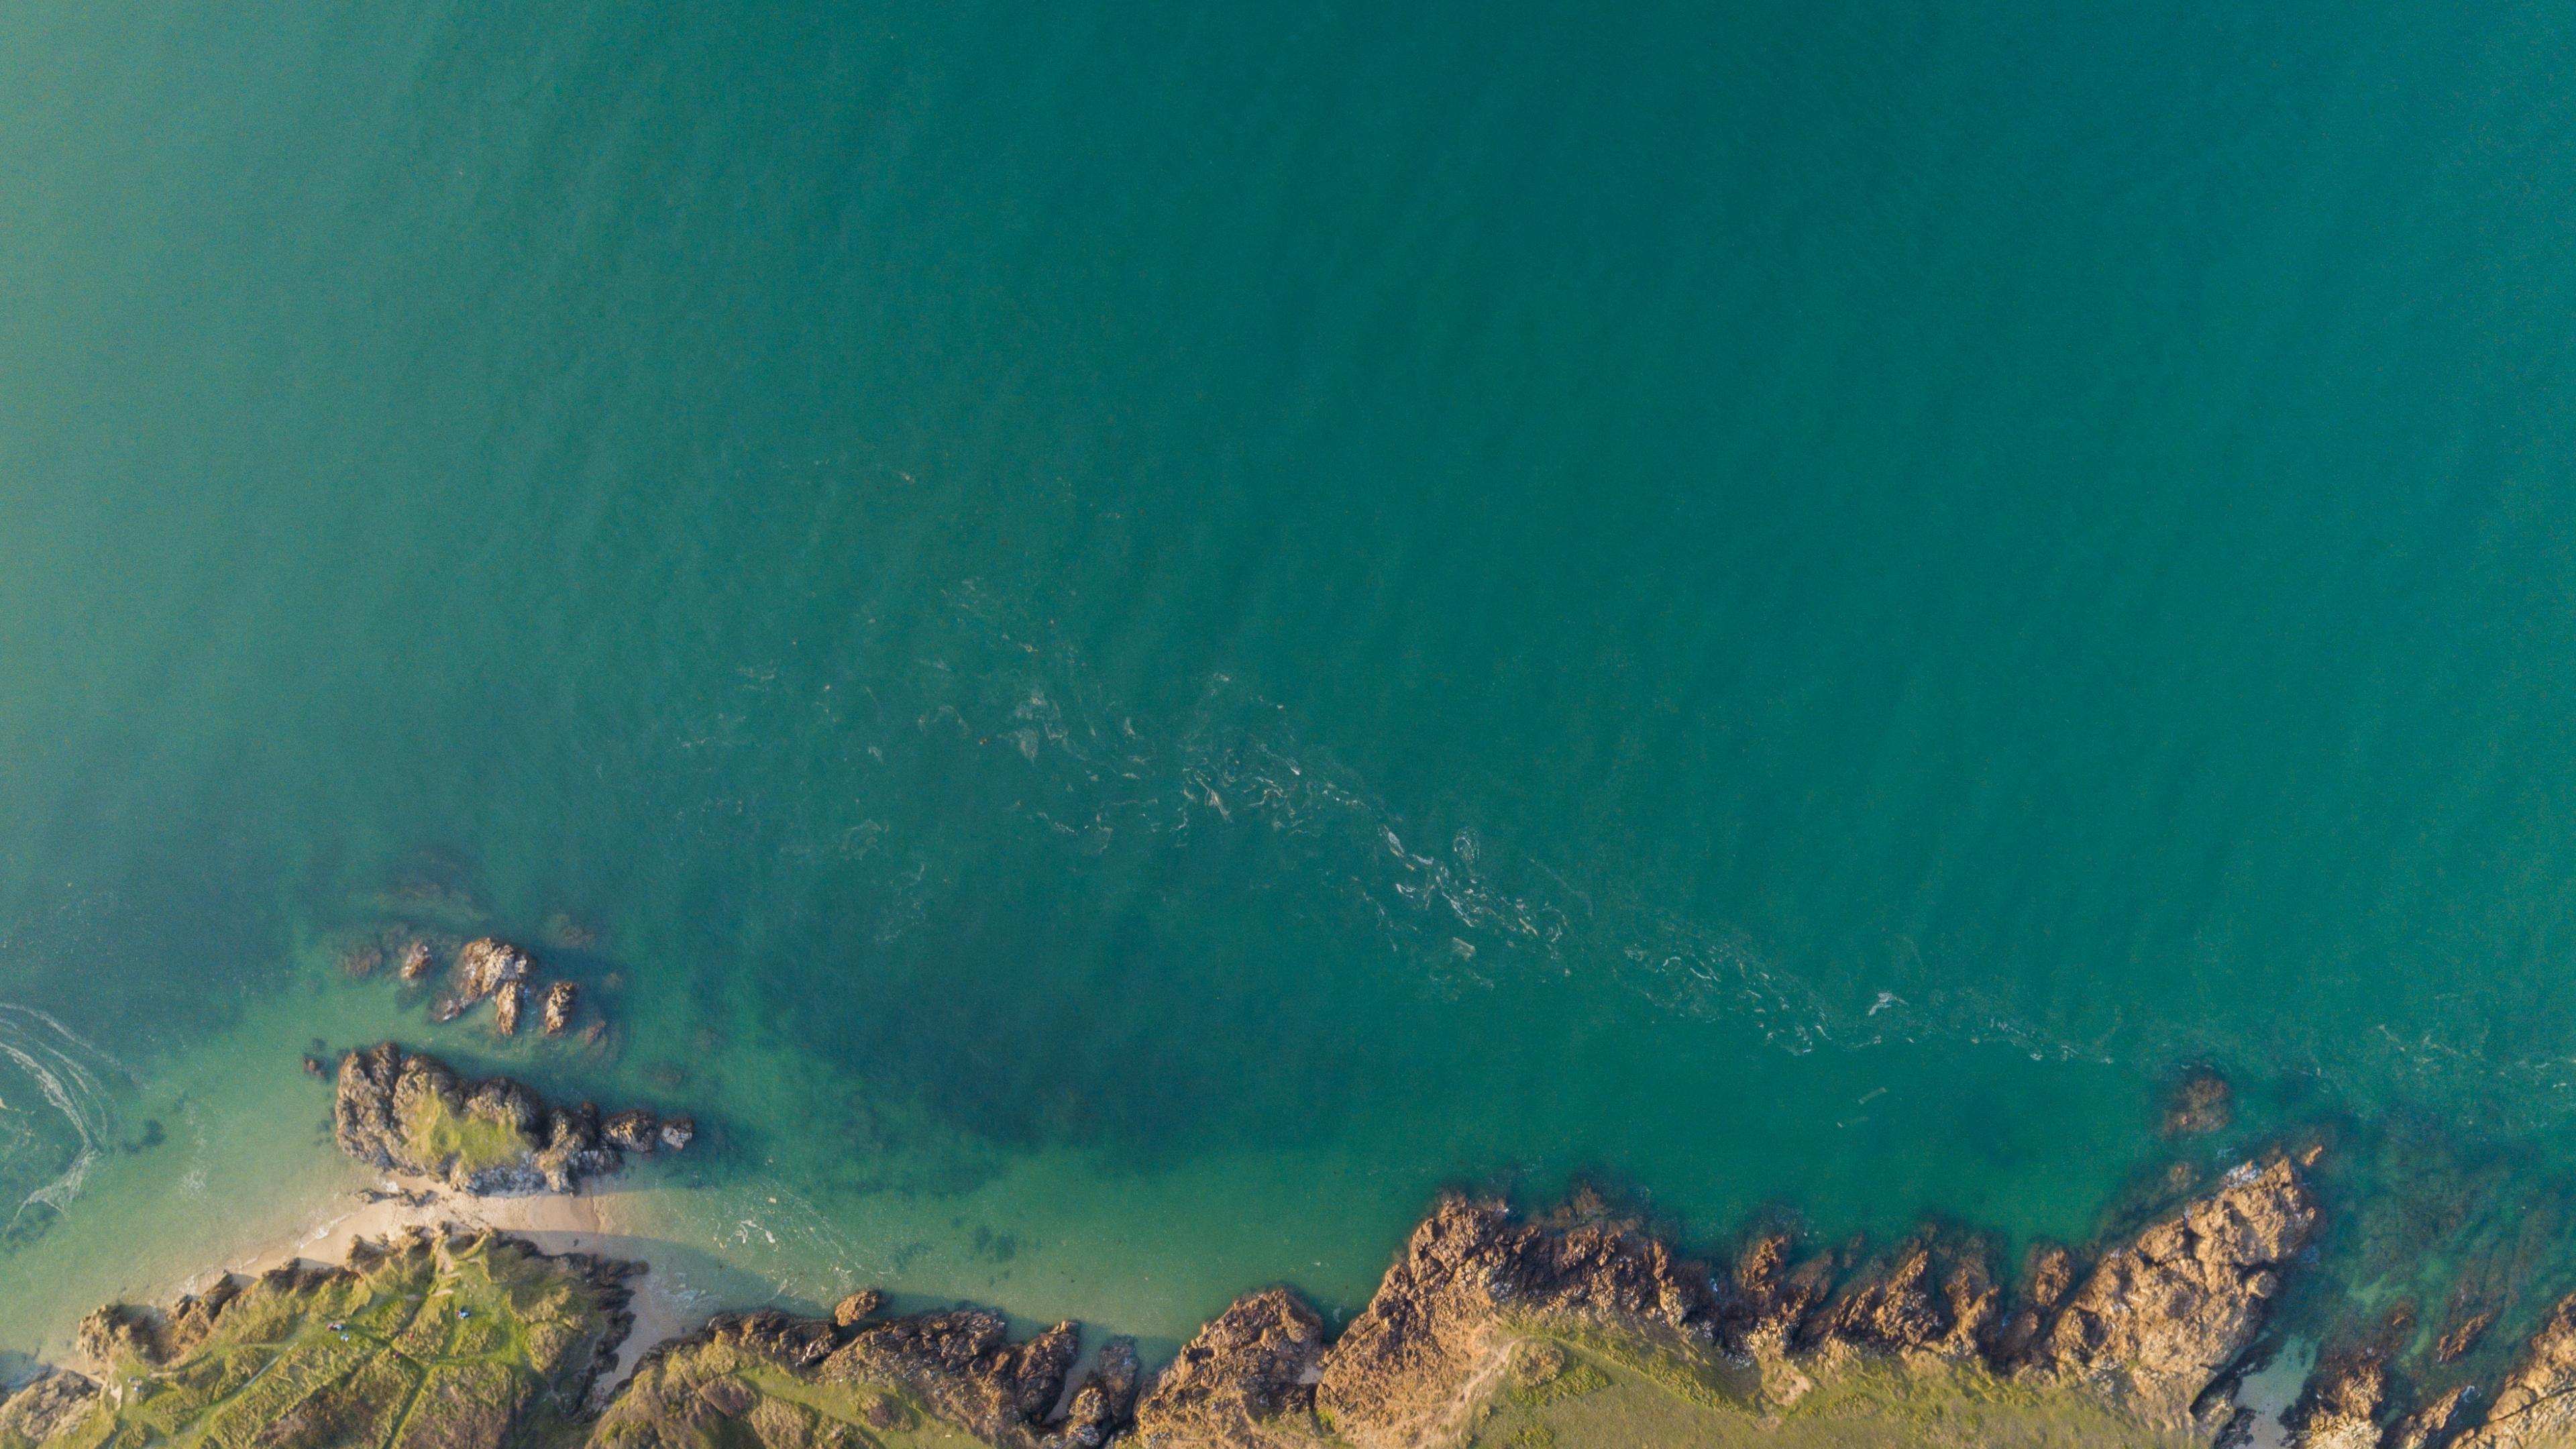 Download 3840x2160 Wallpaper Coast, Aerial View, Sea, 4k ...